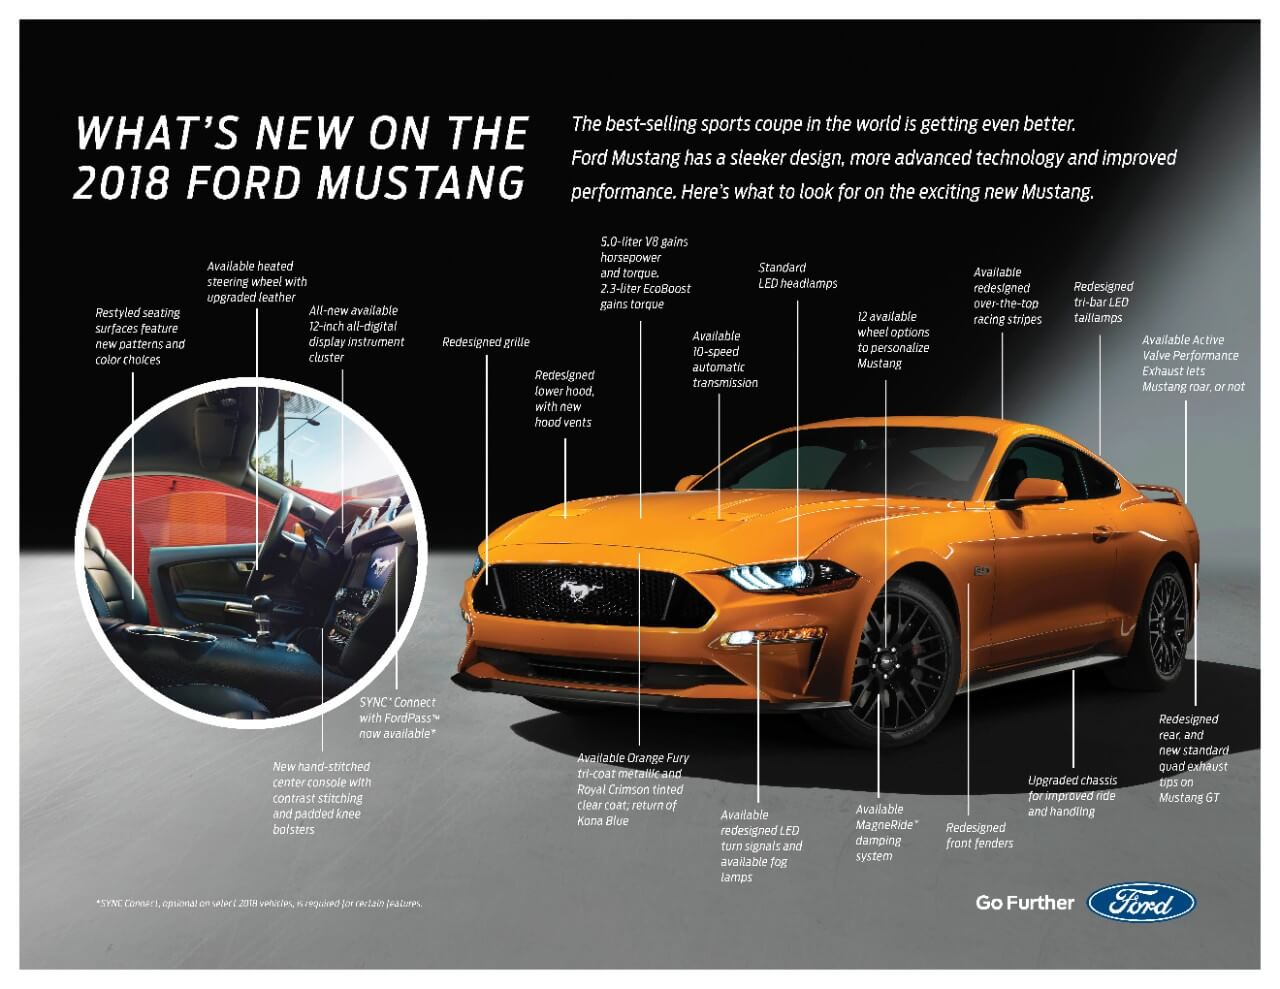 2018 Mustang Orange Fury face lift mustang fan club mustangfanclub release features